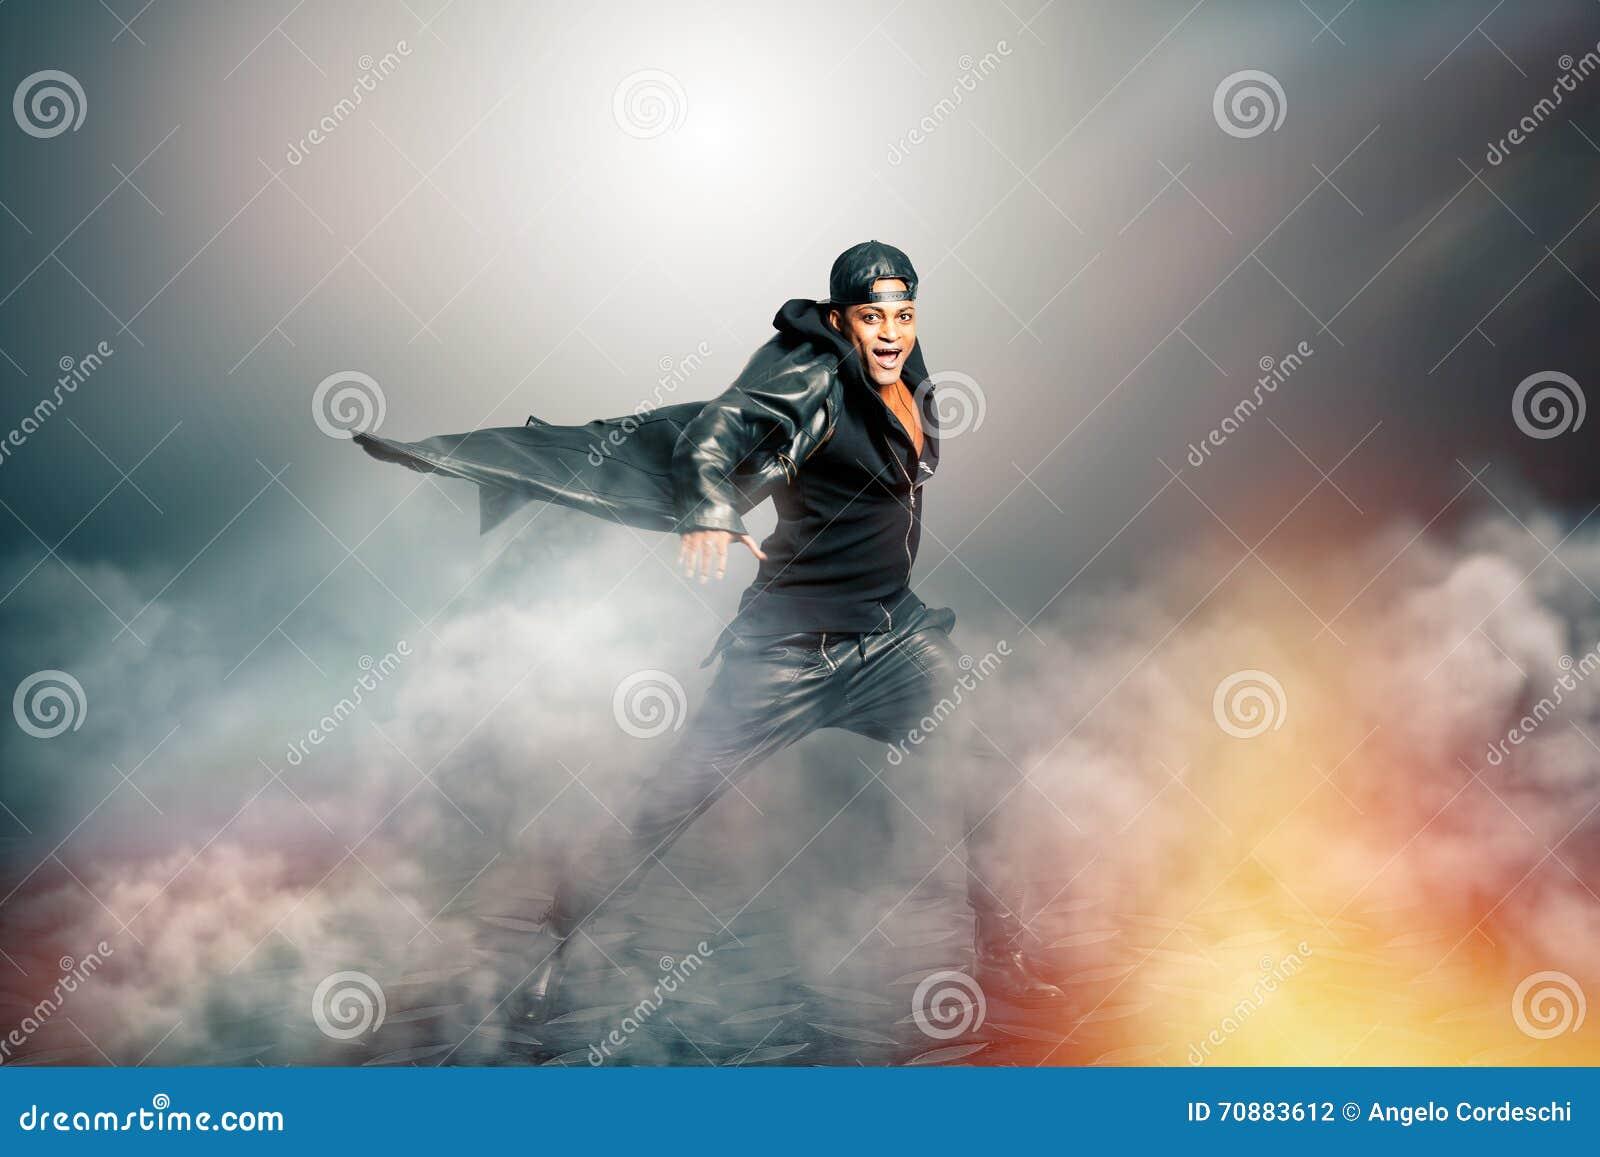 Cantante de roca de sexo masculino con el cabo en paisaje misterioso con humo